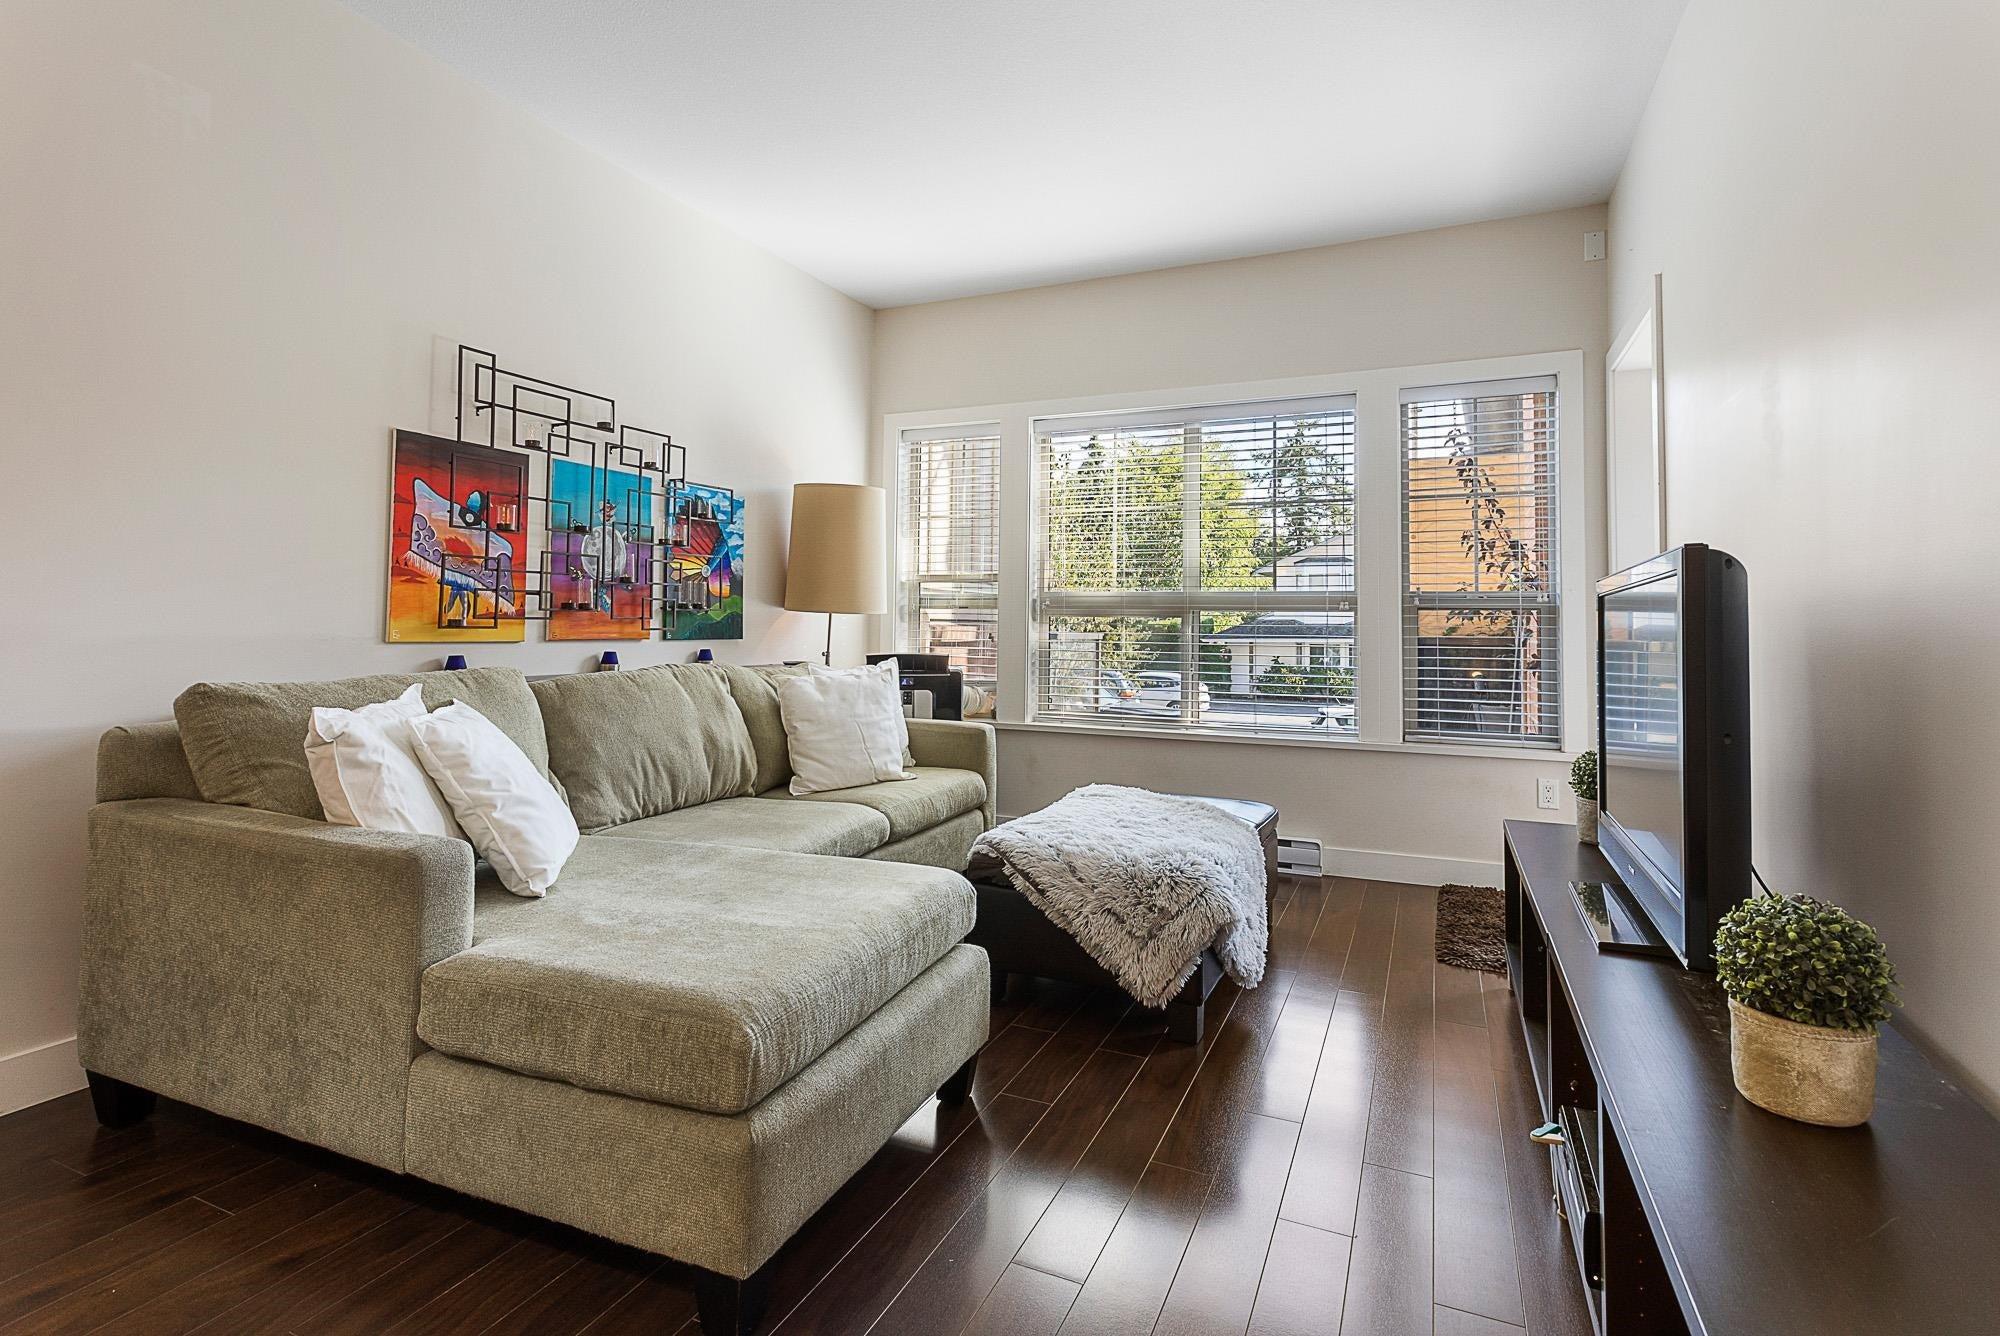 114 20219 54A AVENUE - Langley City Apartment/Condo for sale, 1 Bedroom (R2616172) - #12